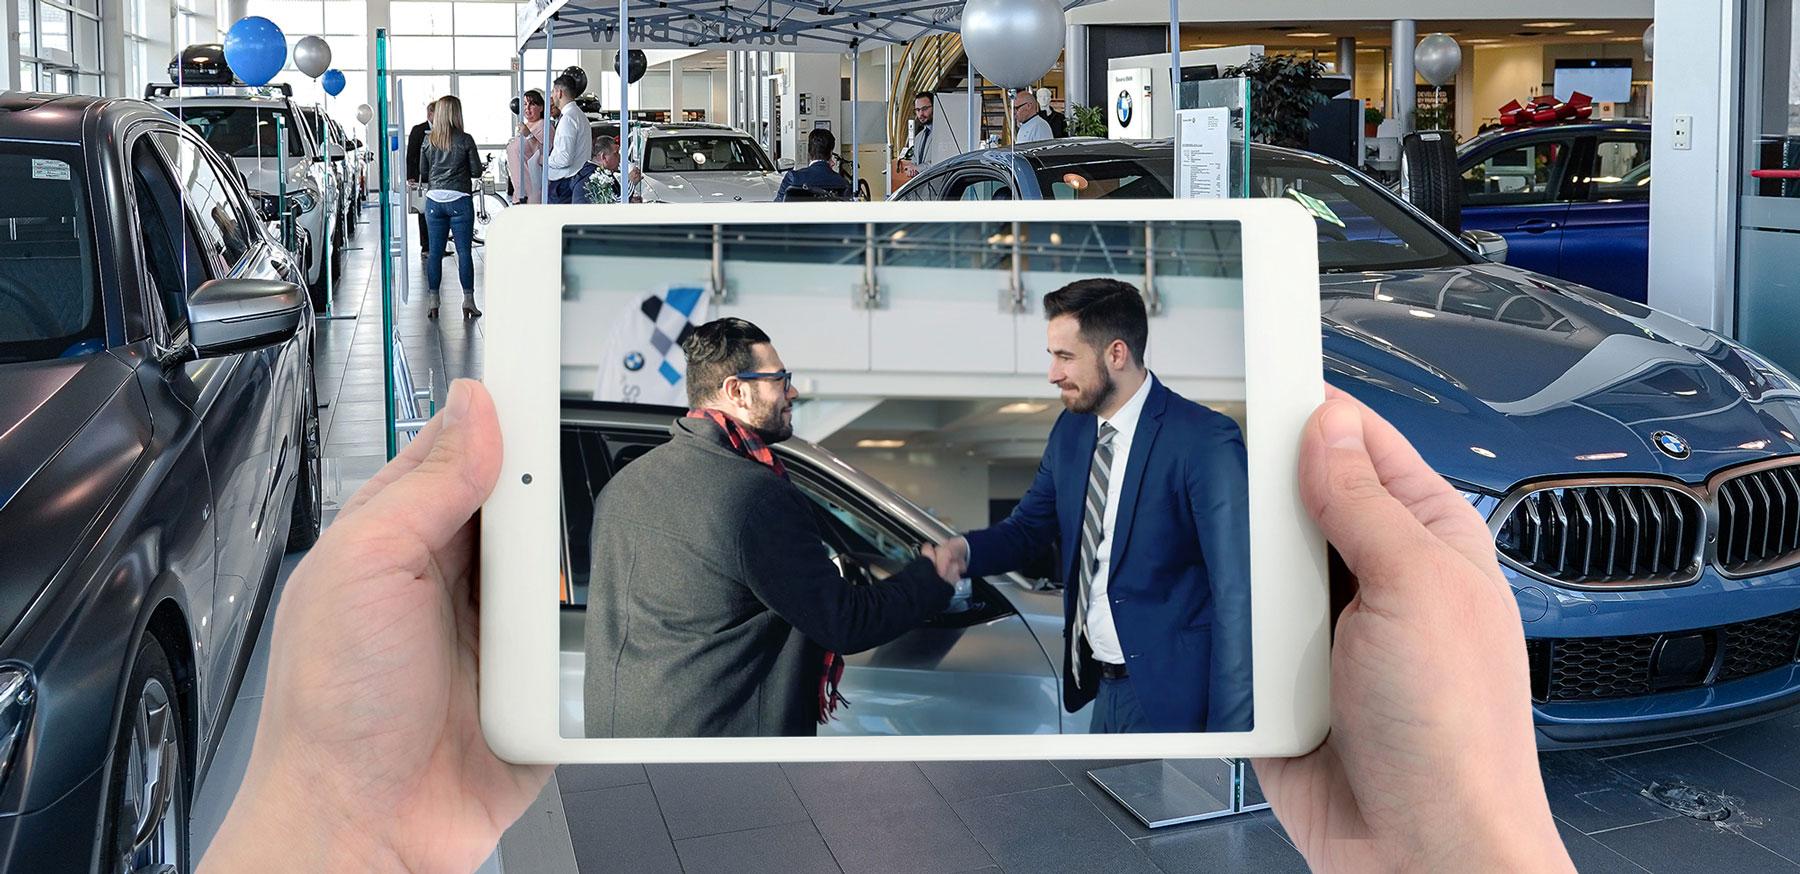 Bavaria BMW video on an iPad